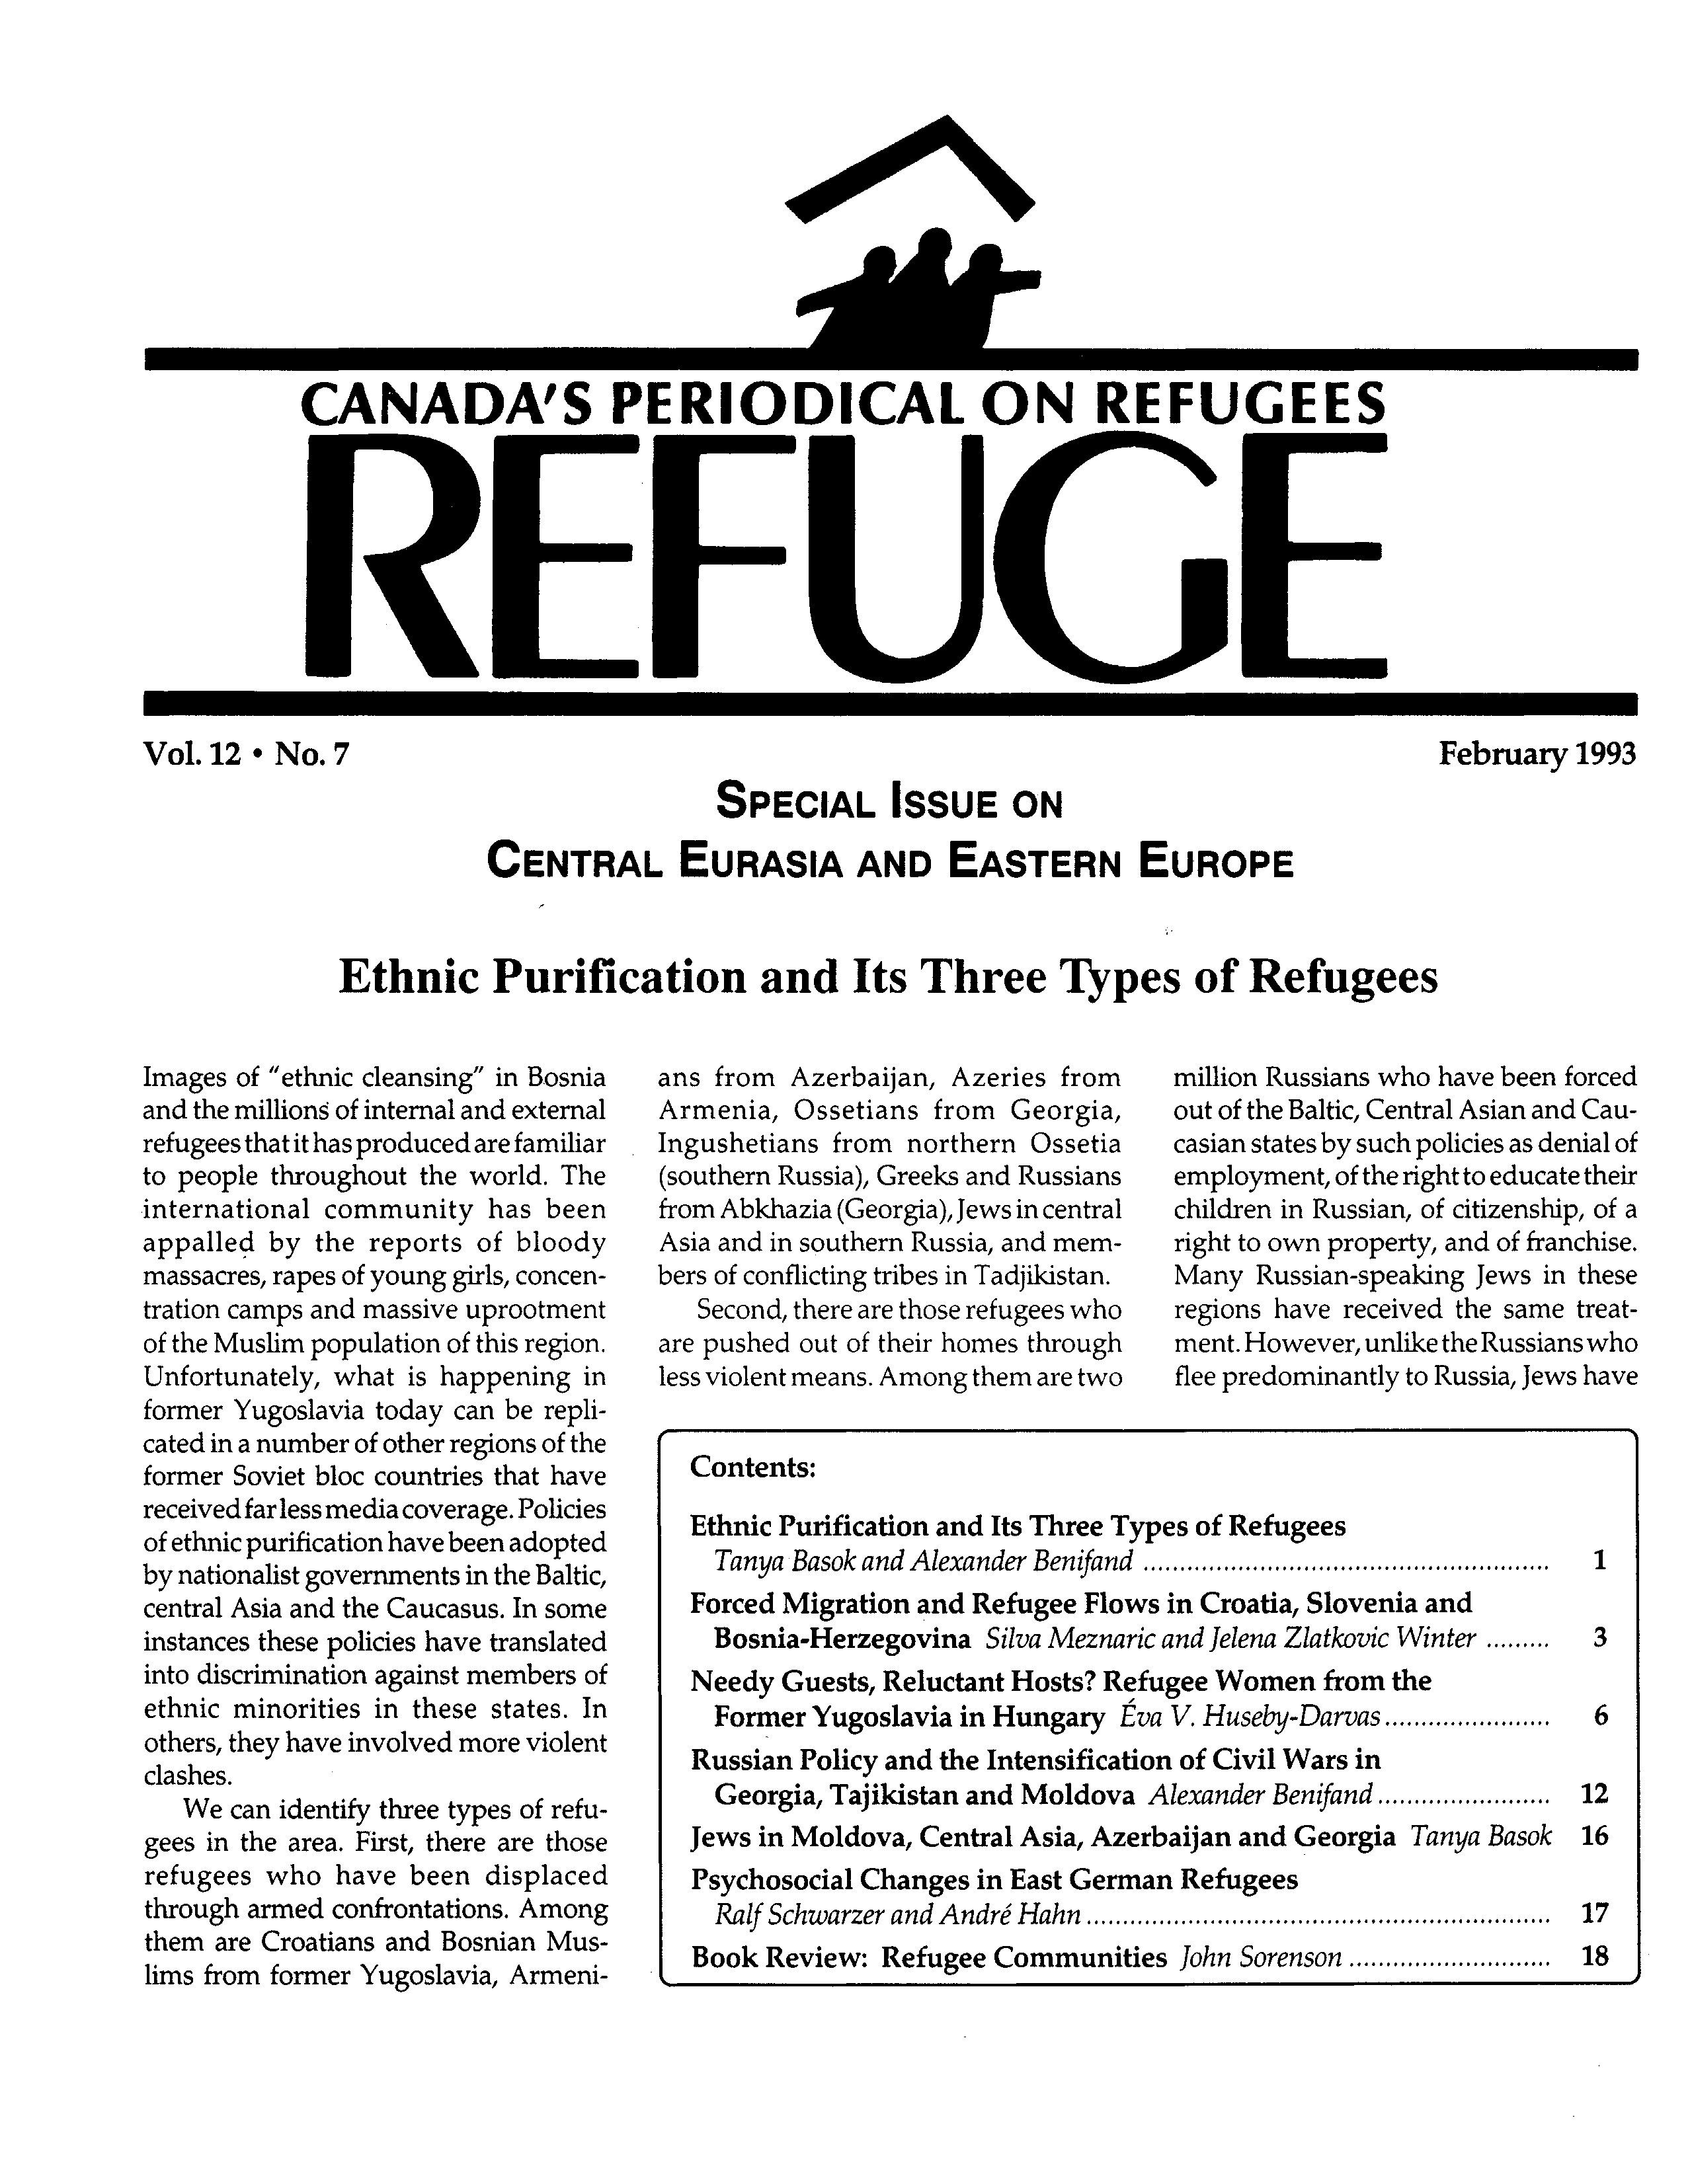 first page Refuge vol. 12.7 1993